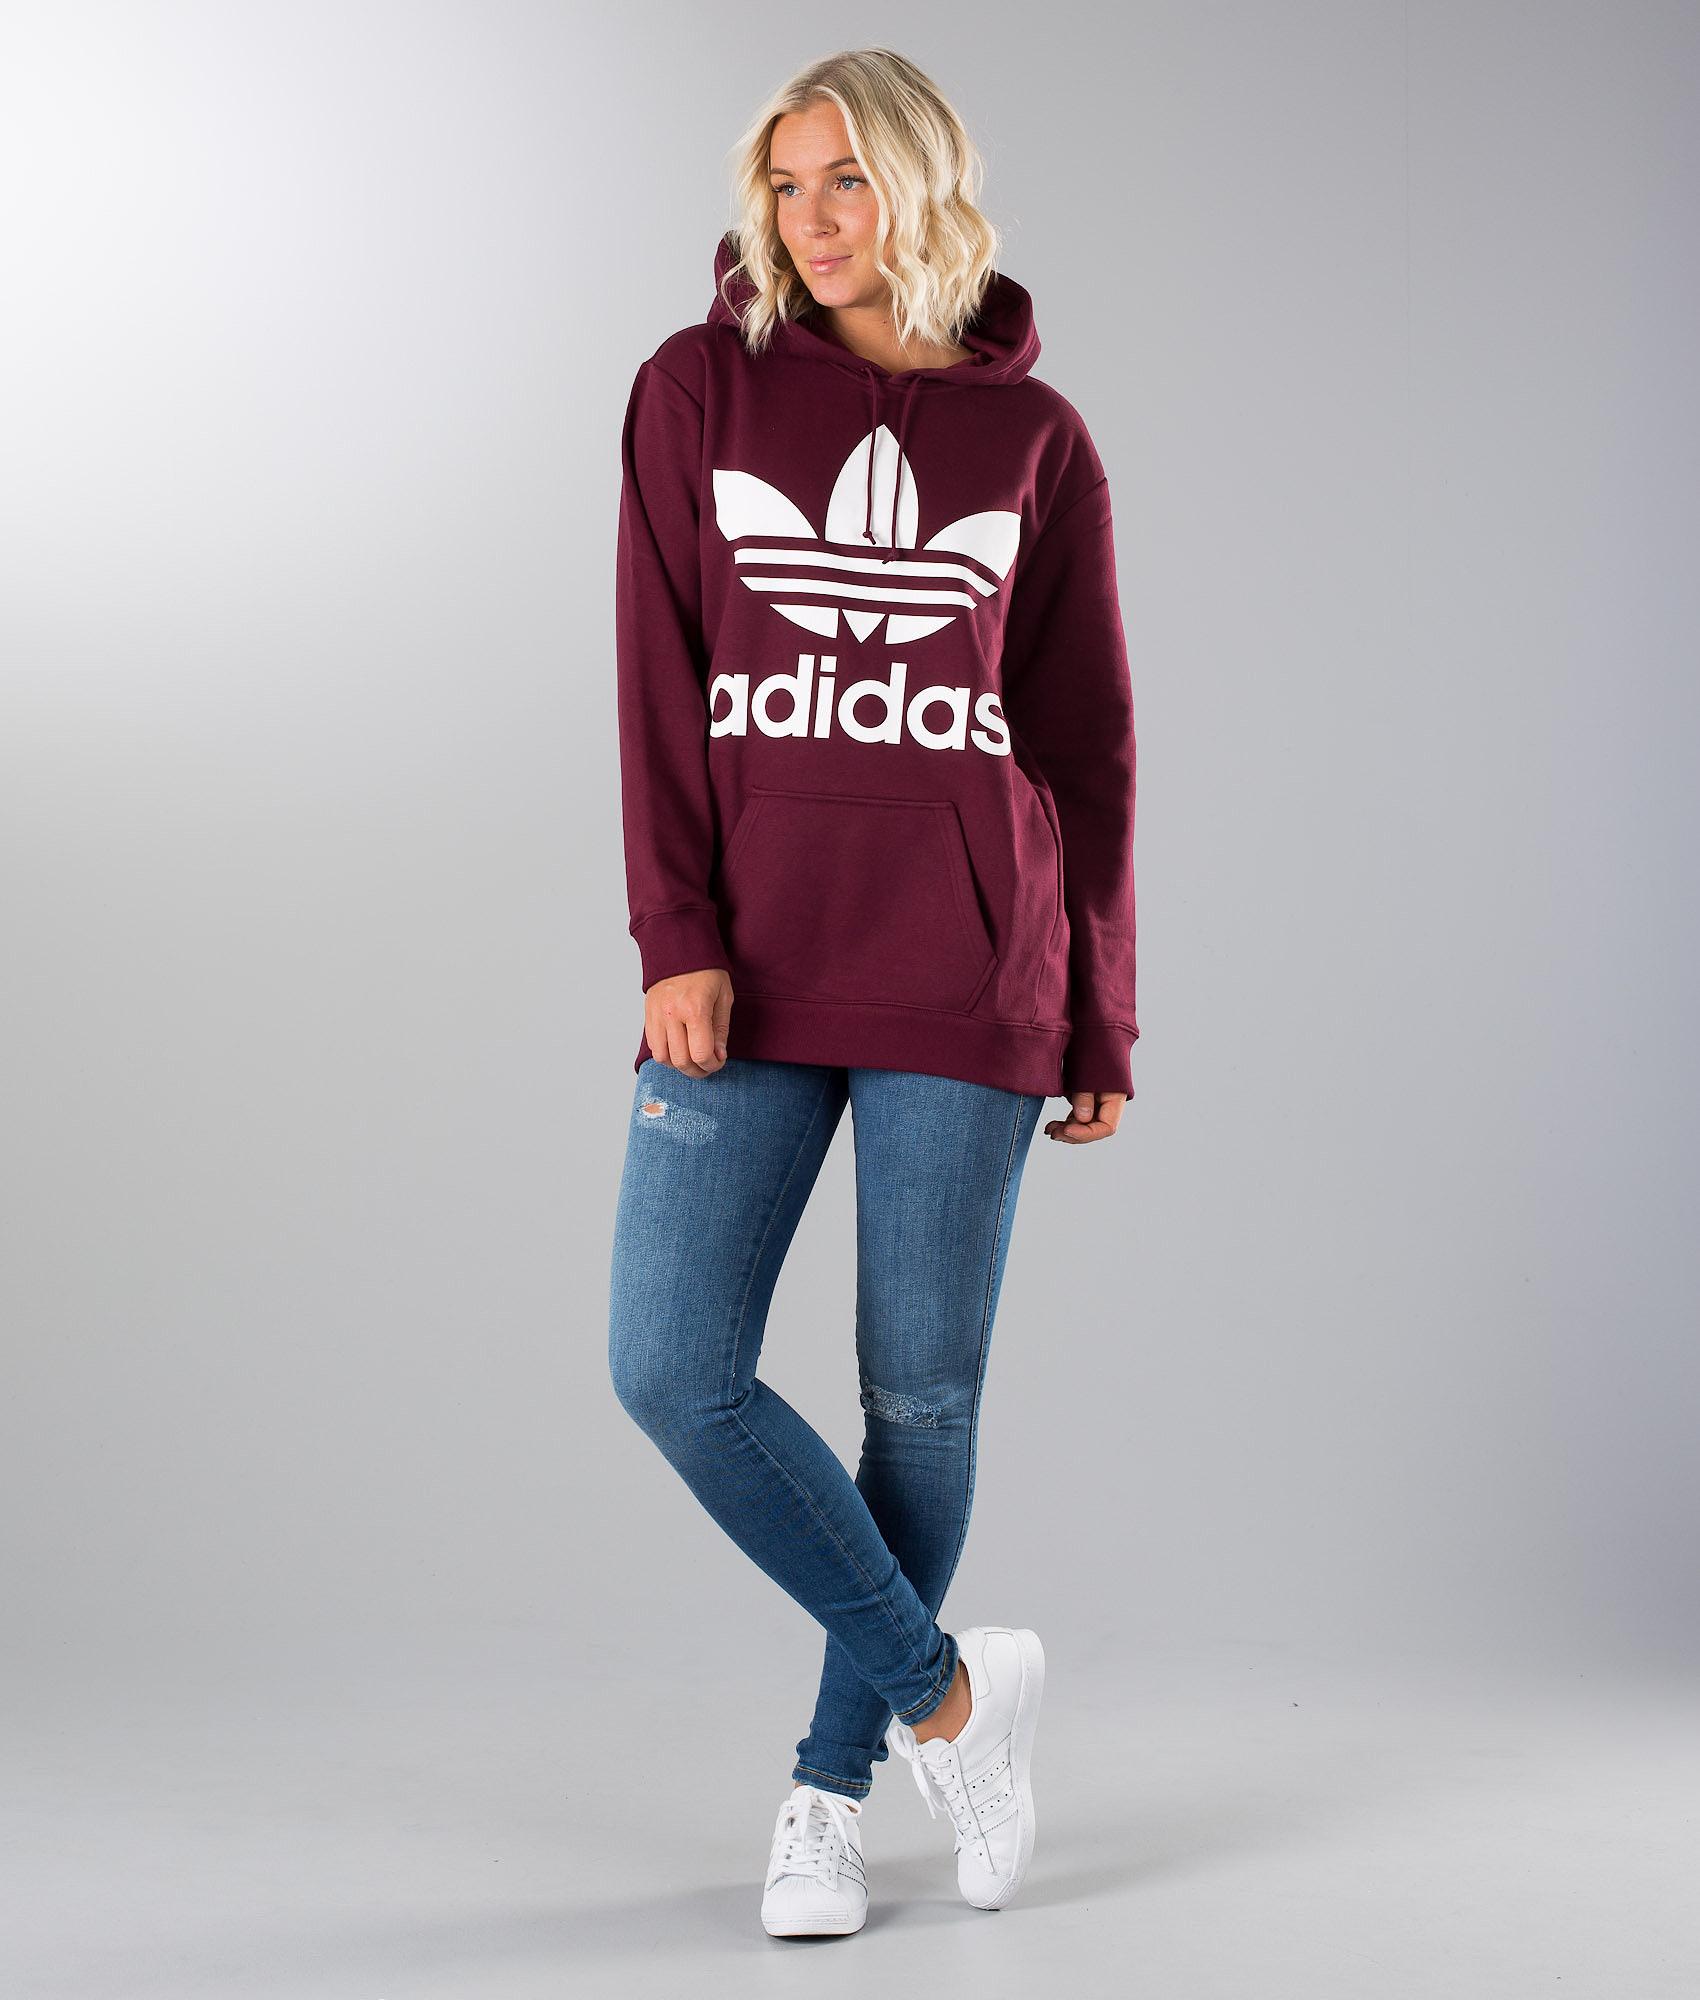 Adidas Originals Boyfriend Trefoil Hood Maroon - Ridestore.com 316c7487af